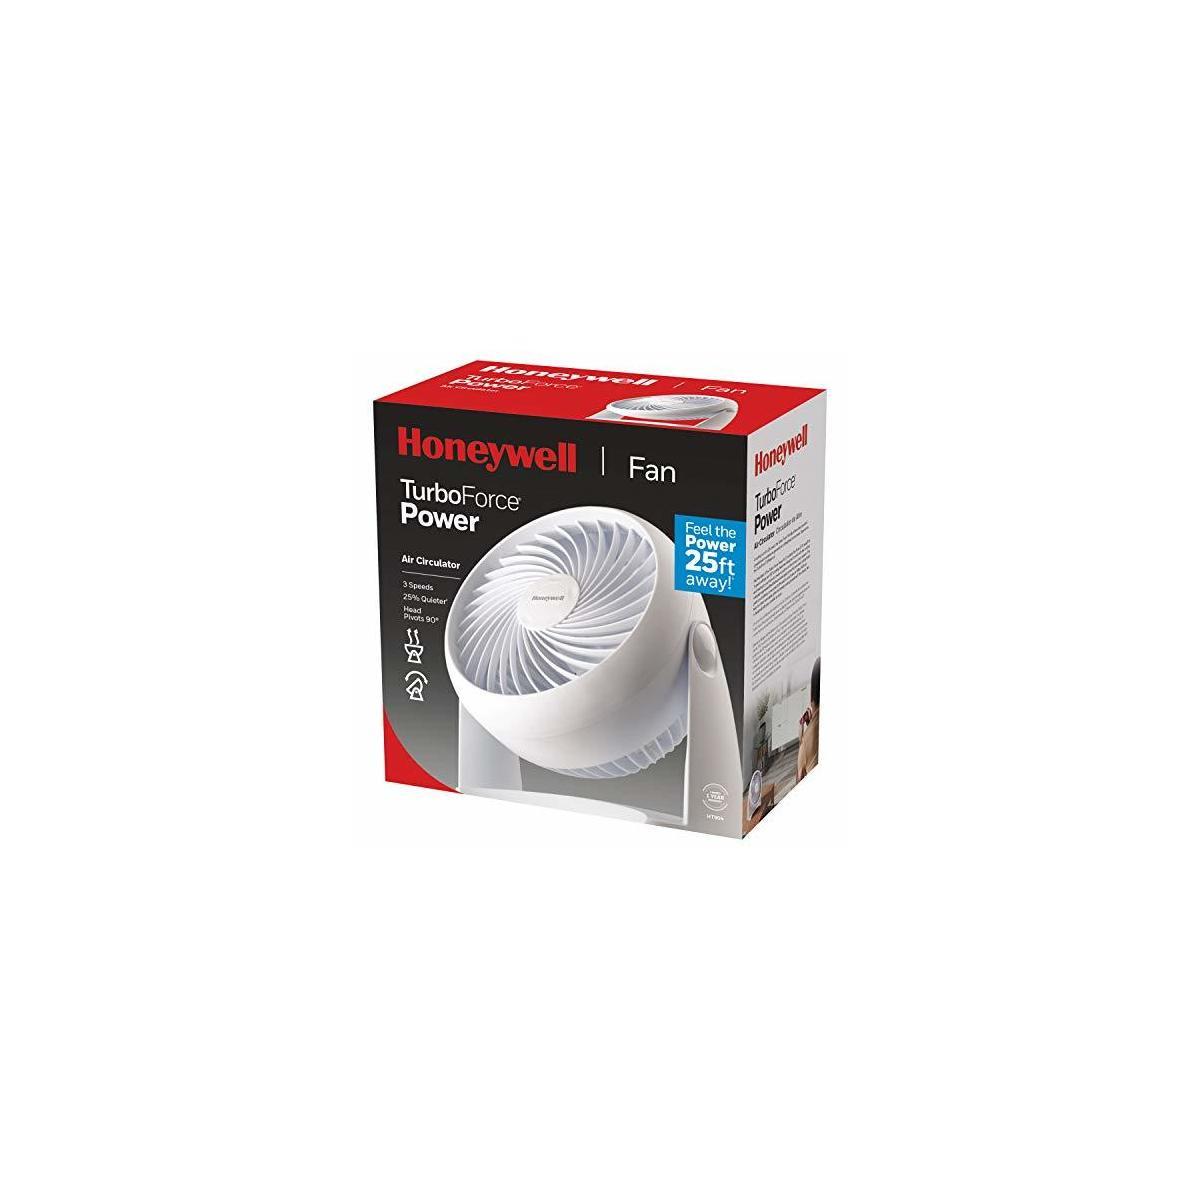 Honeywell Kaz HT-904 Tabletop Air-Circulator Fan White